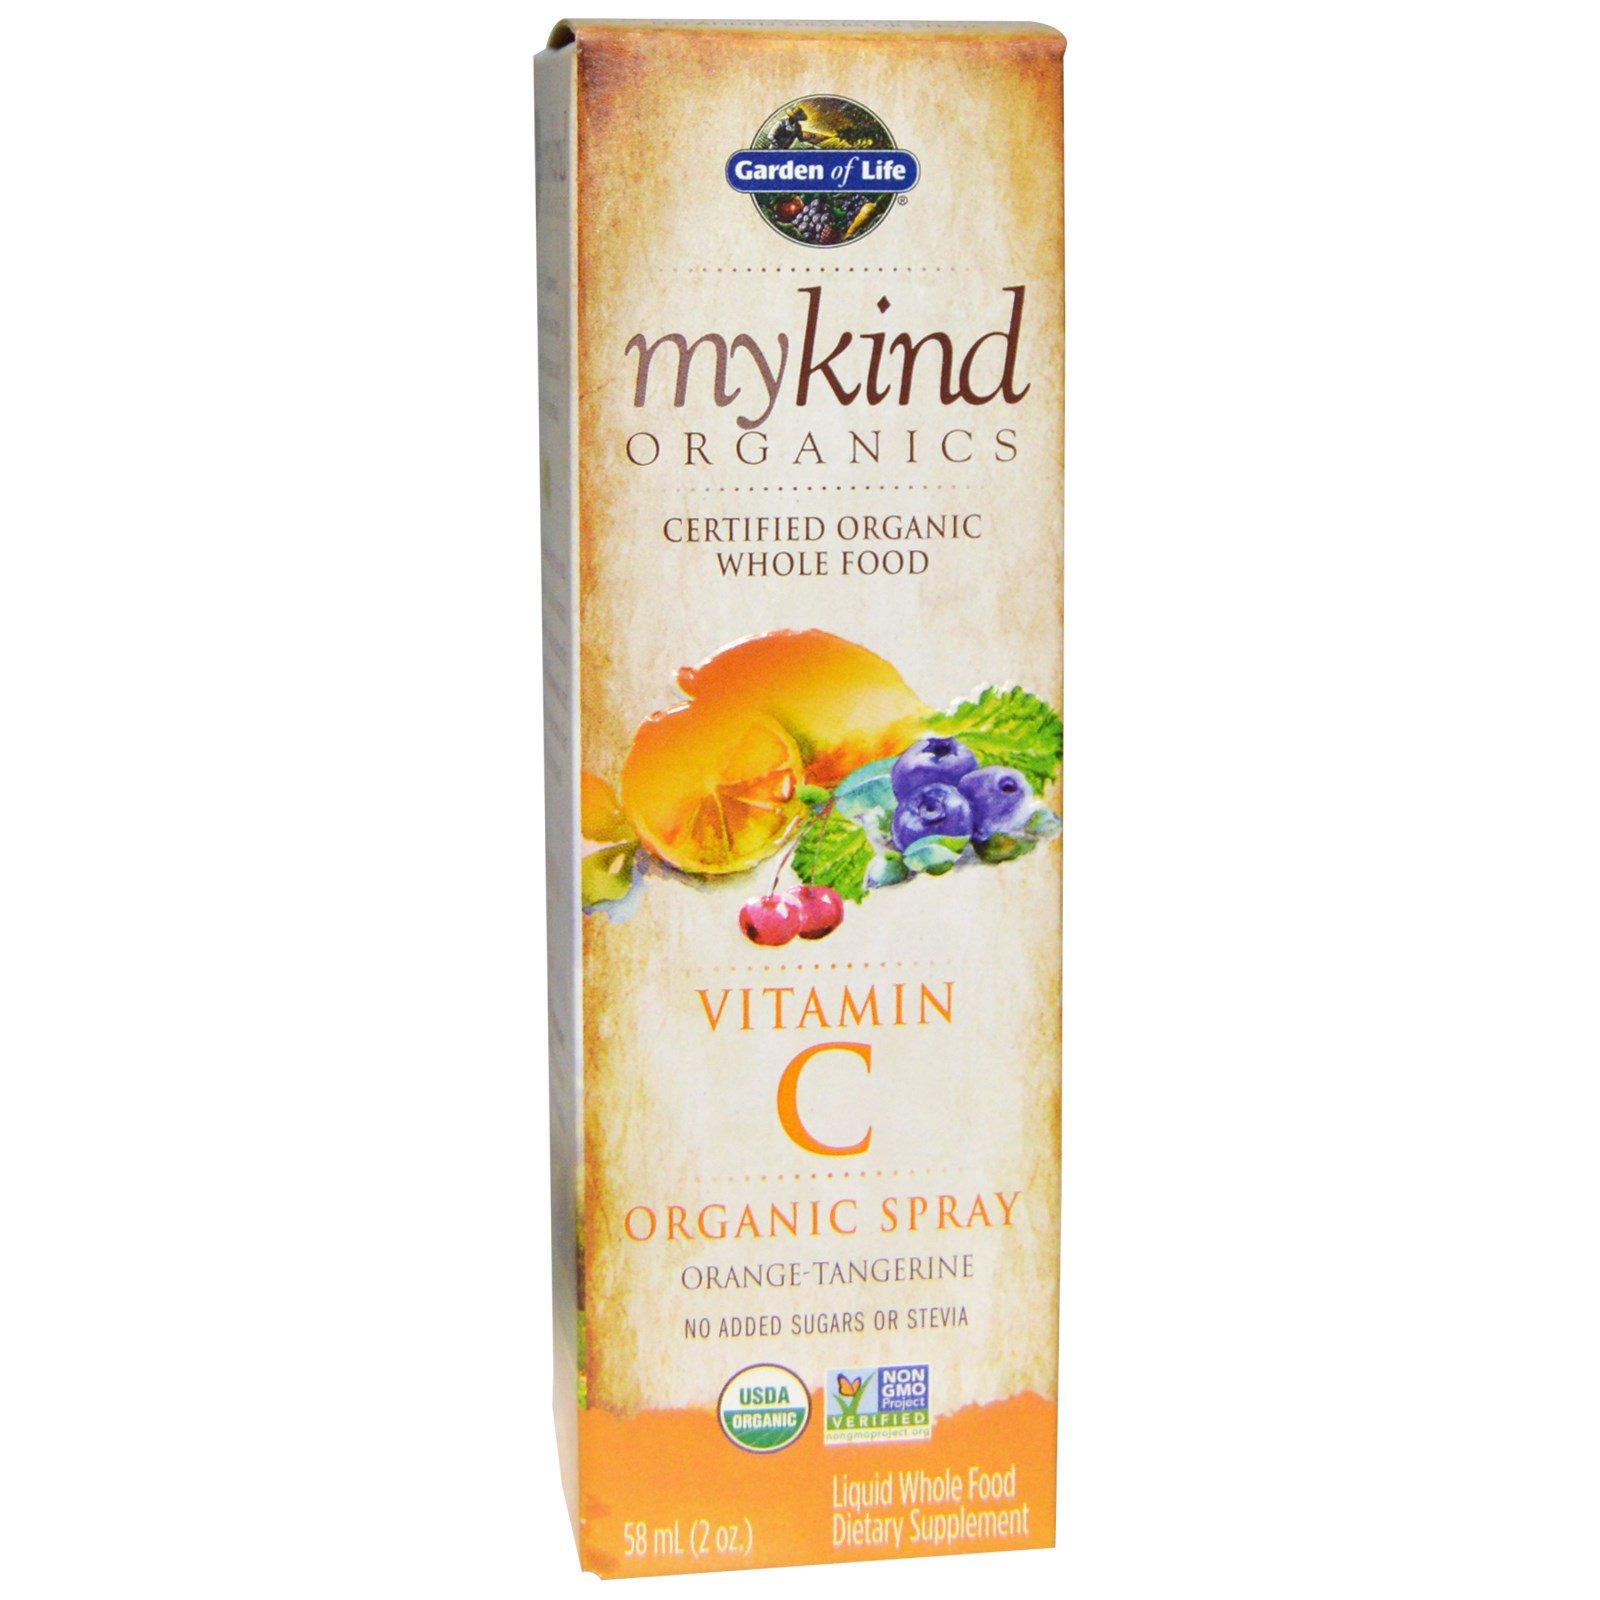 Garden of Life, mykind Organics, витамин C, органический спрей, апельсин-мандарин, 2 жидких унций (58 мл)